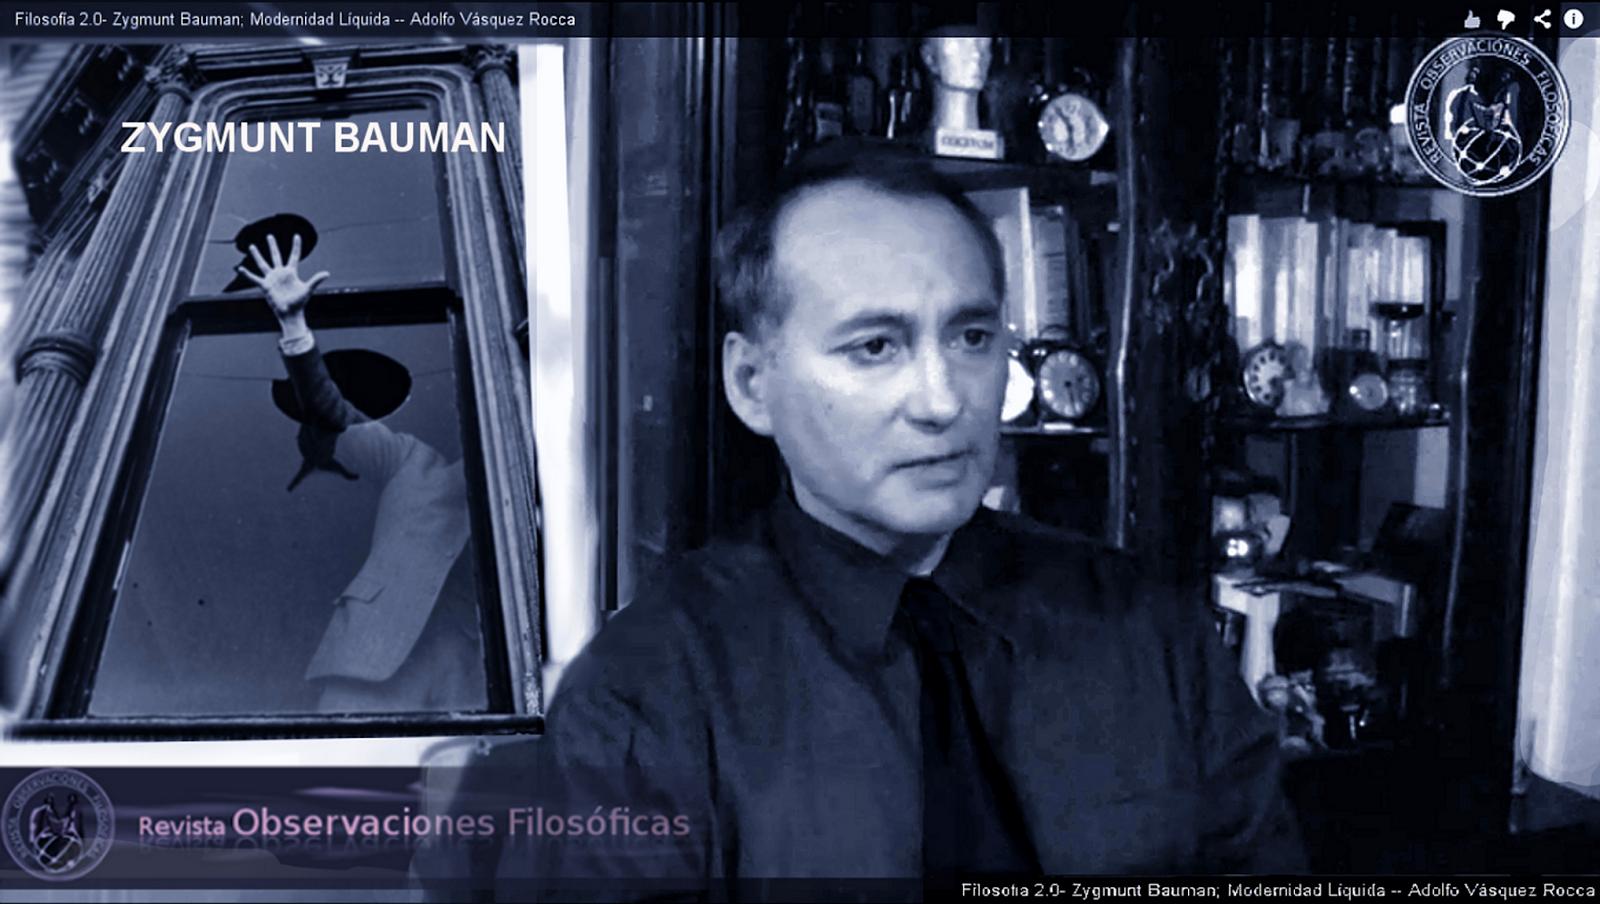 http://2.bp.blogspot.com/-Ce_FaBfRLTs/Uo1ze_J-baI/AAAAAAAAMBo/JdYvfmh6t84/s1600/Video+Conferencia+_+BAUMAN+ZIGMUNT+_++Blue+ROF+Logo+70XL+_+Modernidad+Liquida+_+ADOLFO+VASQUEZ+ROCCA+D.Phil.png